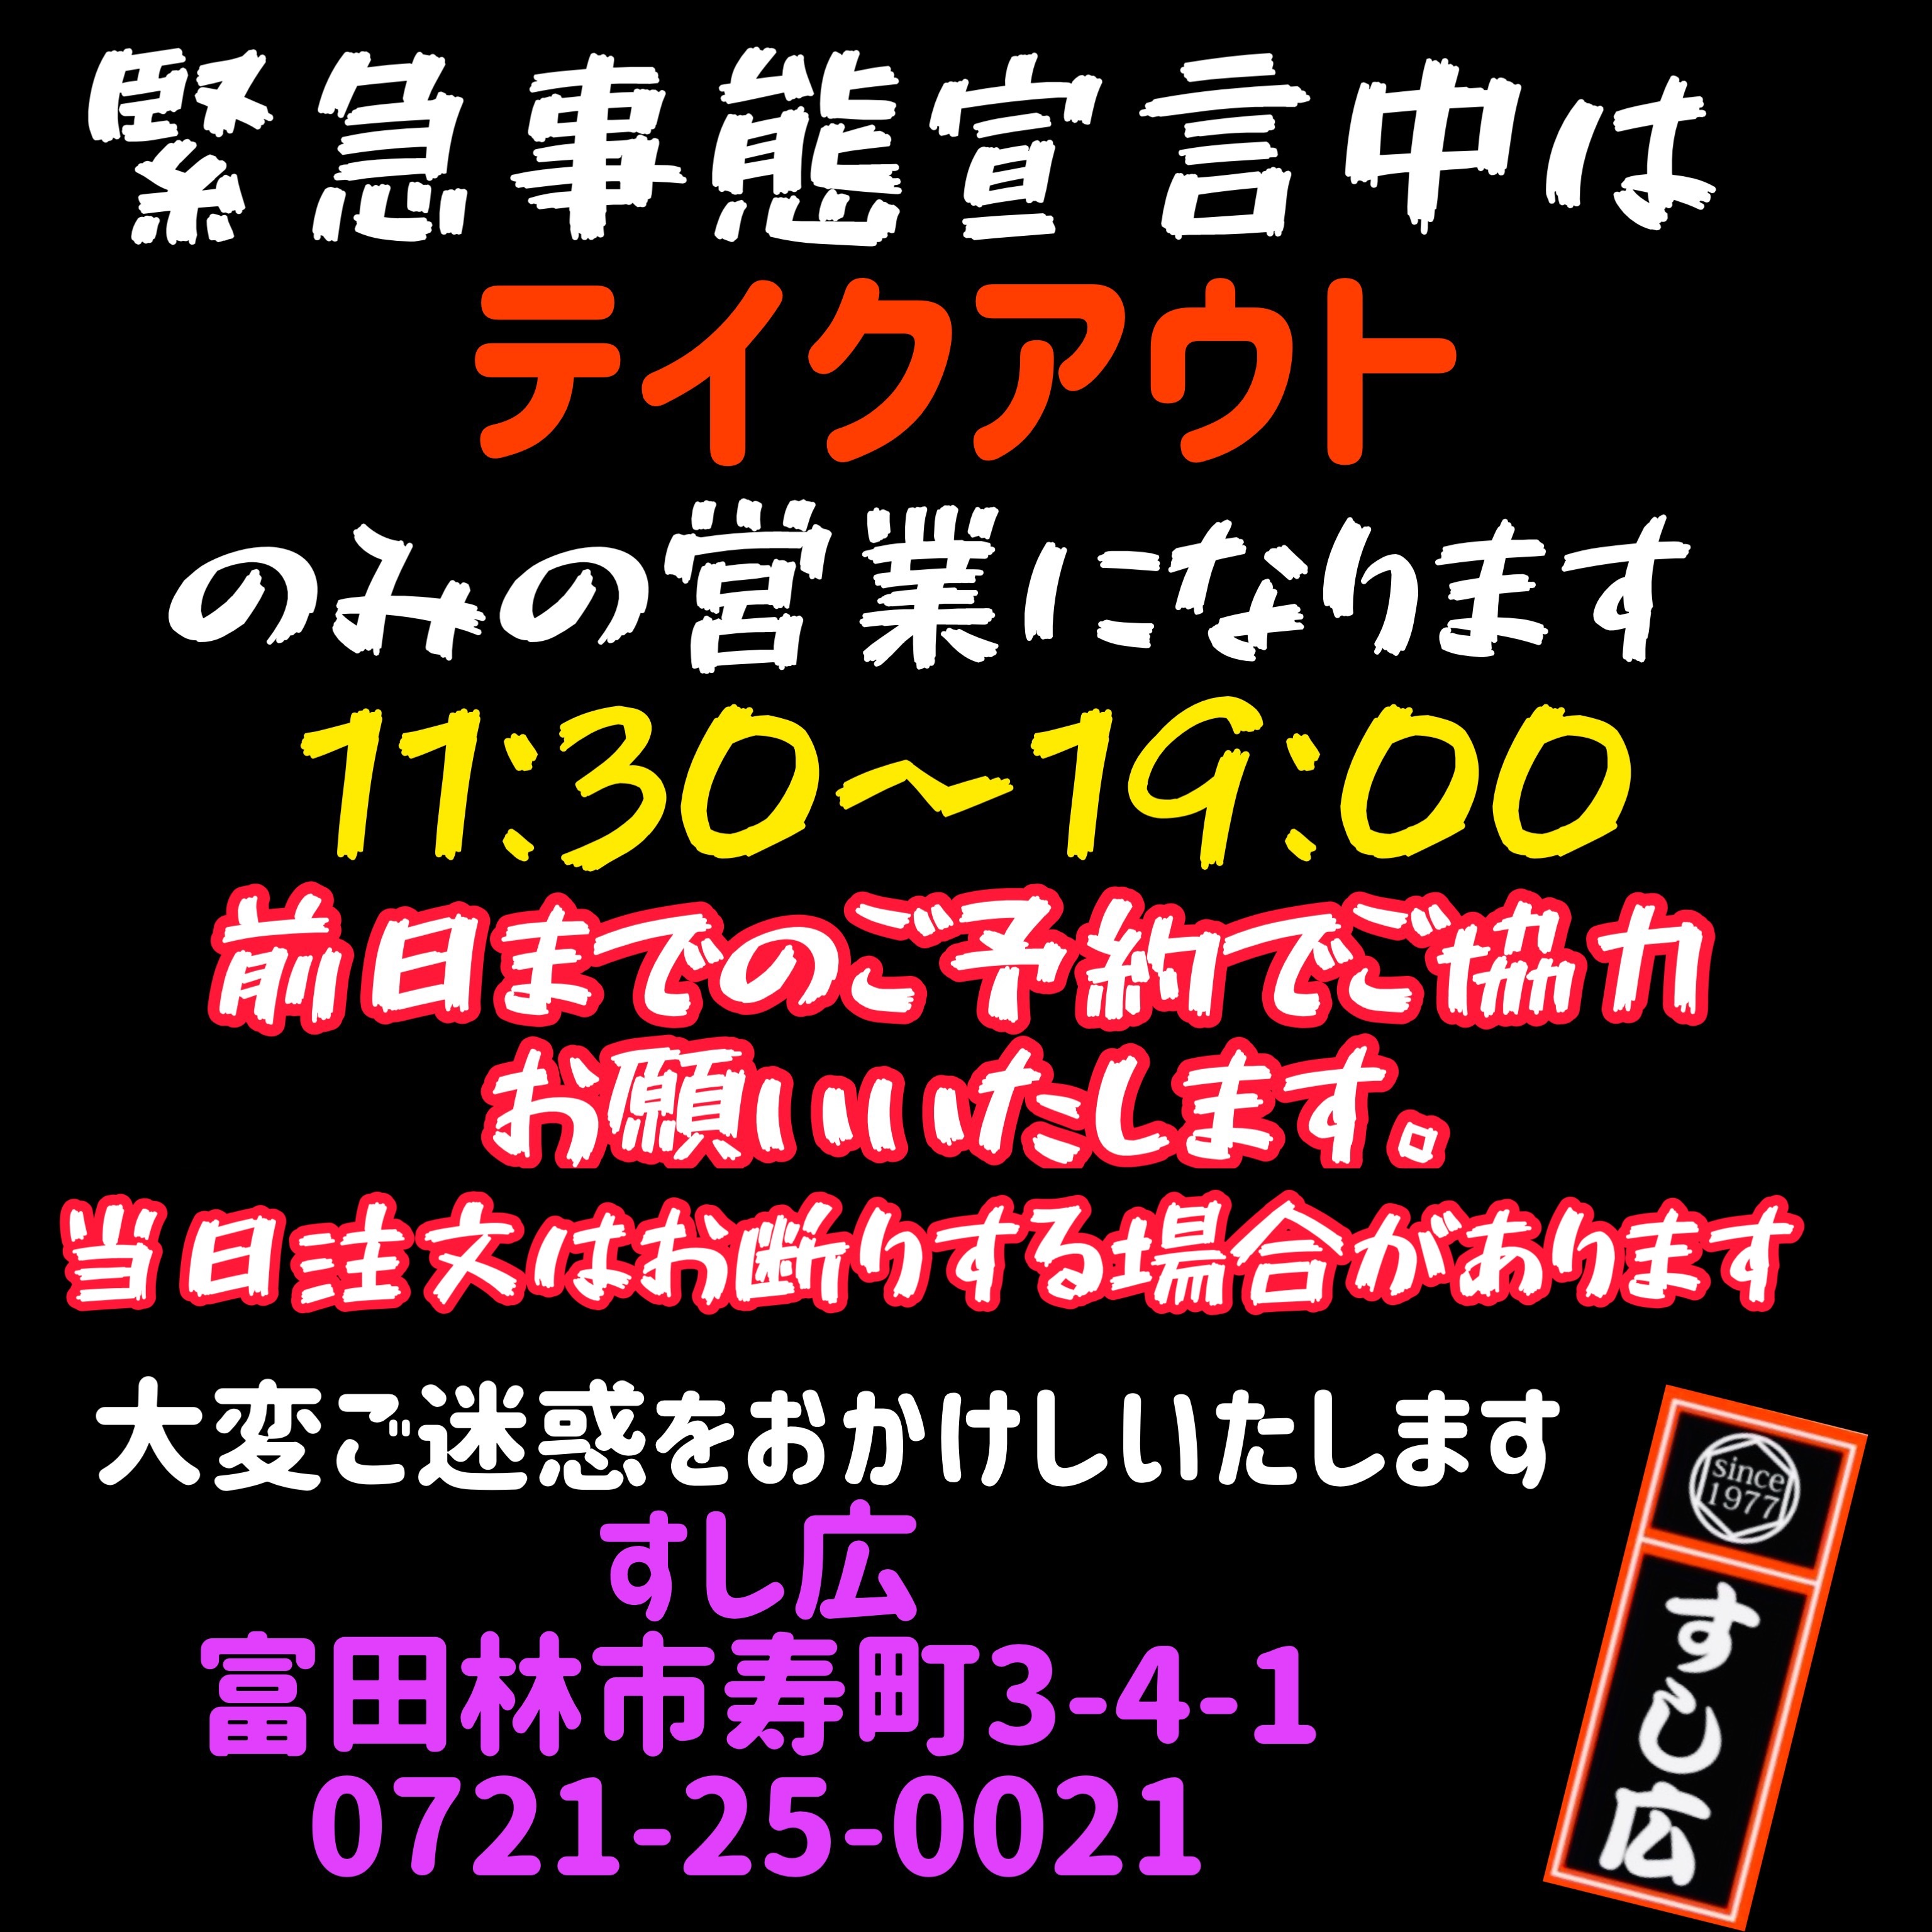 f:id:carp_0301_kenta:20210802075753j:image